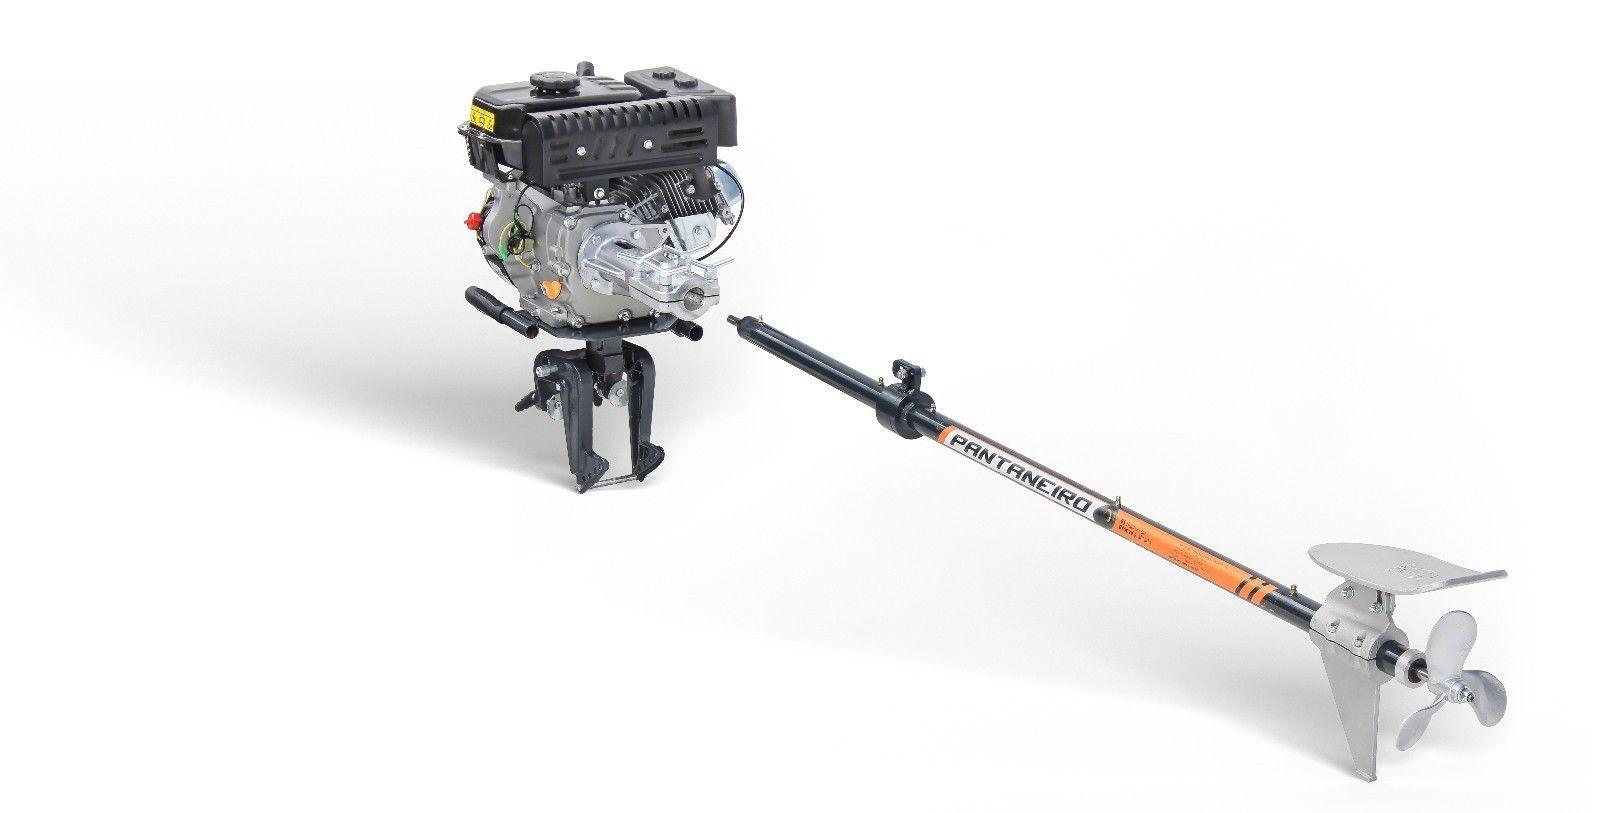 Meghi 39 s mud motor 2 20 m 13 15 hp long tail boat motor for 15 hp electric boat motor